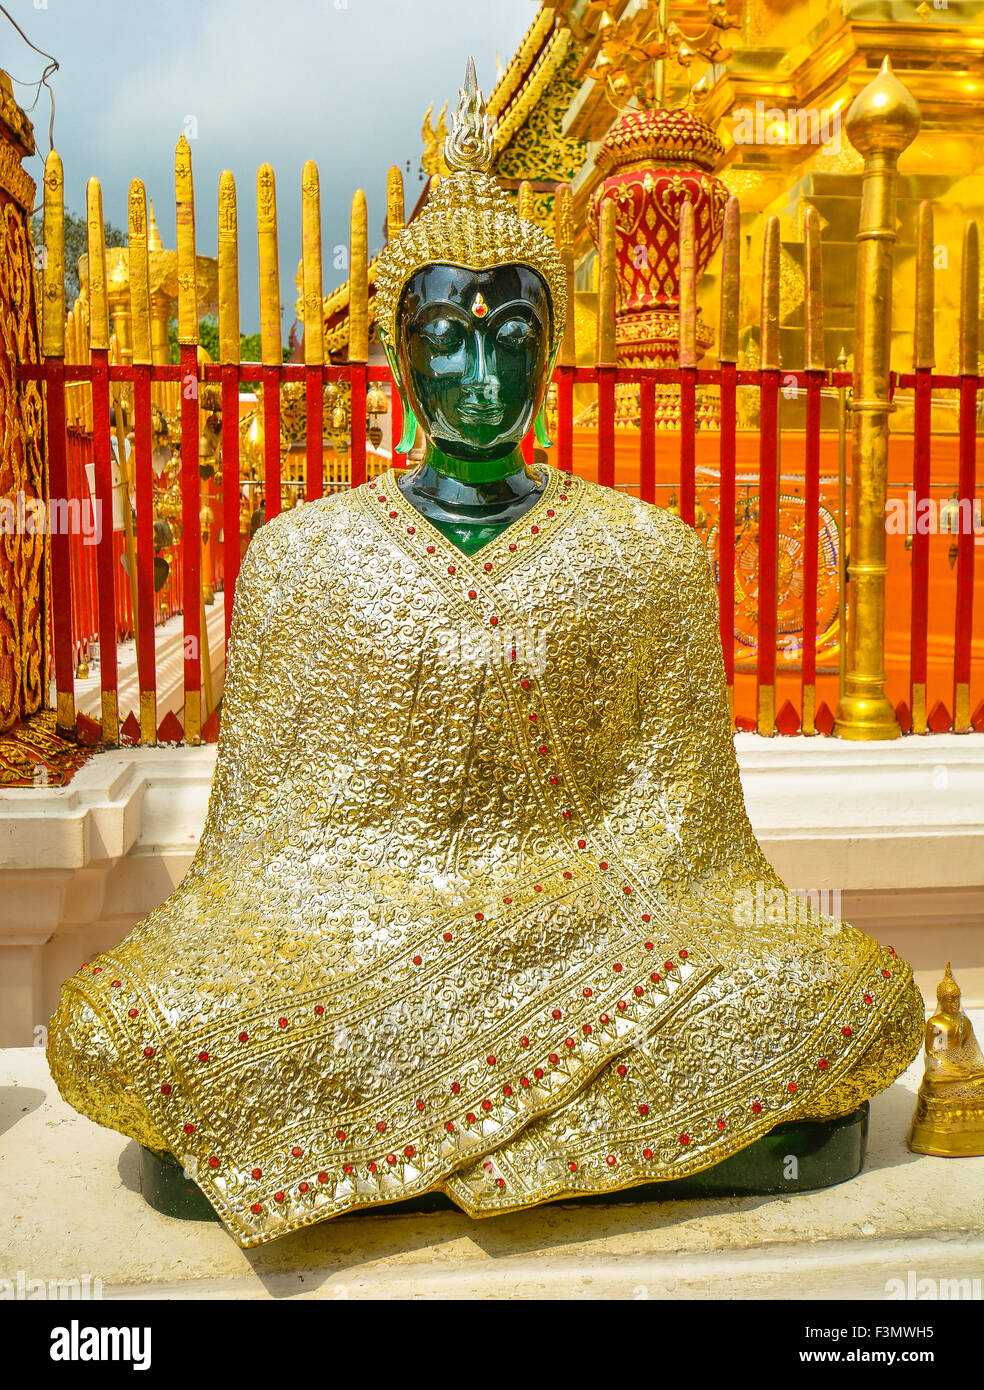 Jade Buddha Clad in Gilded Cloth, Wat Phra That Doi Suthep - Chiang Mai, Thailand - Stock Image